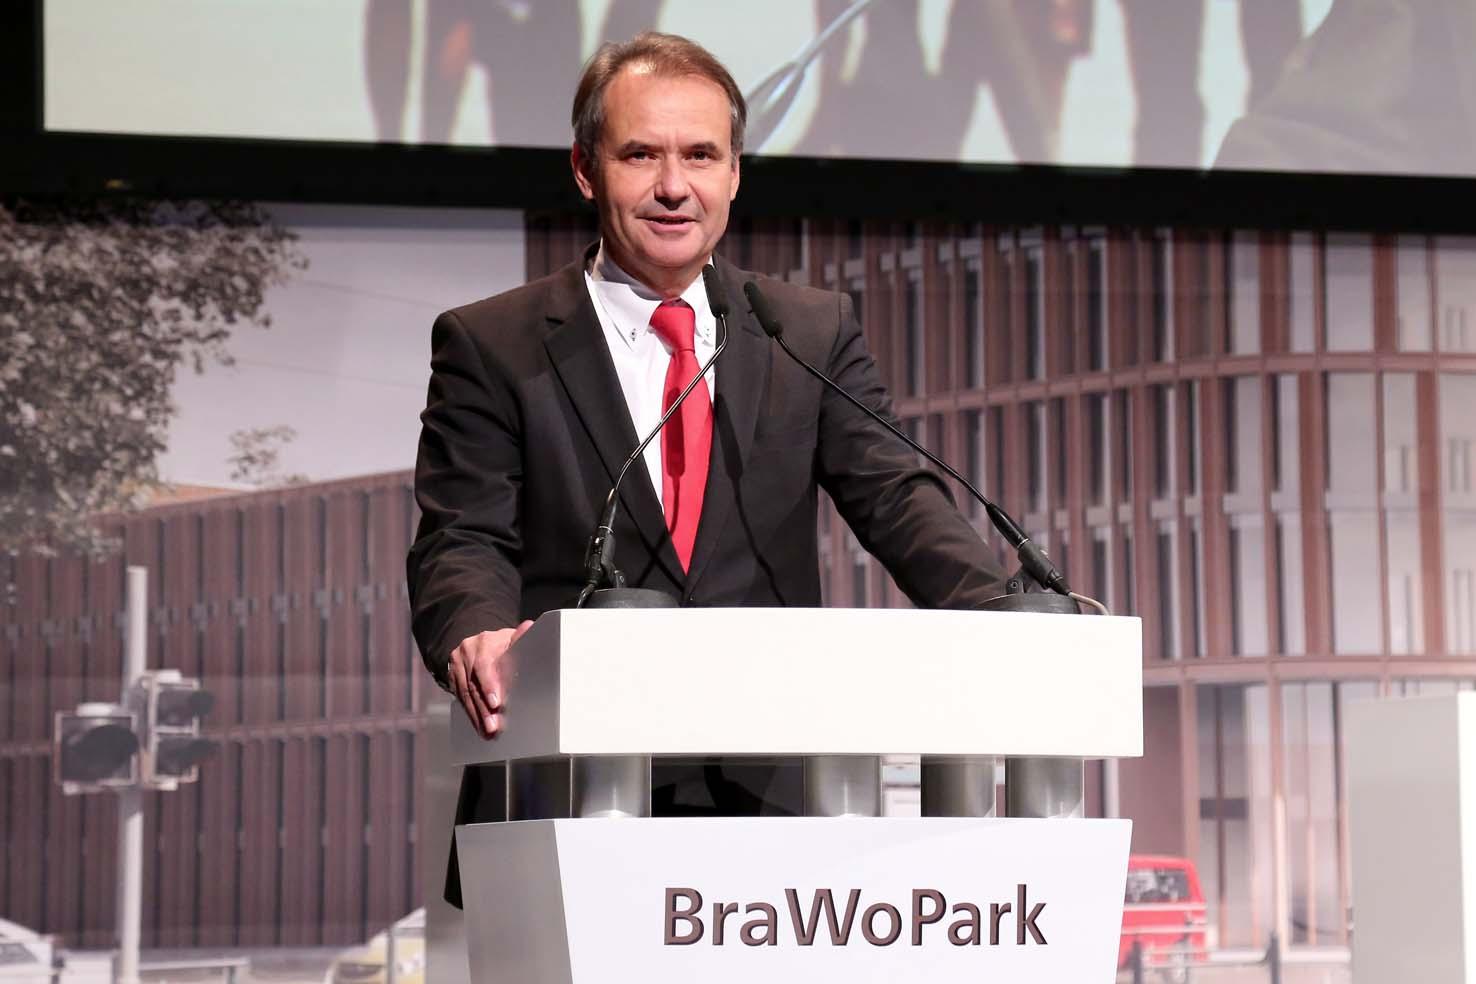 2 - BraWoPark - Dirk Wink-Hartmann